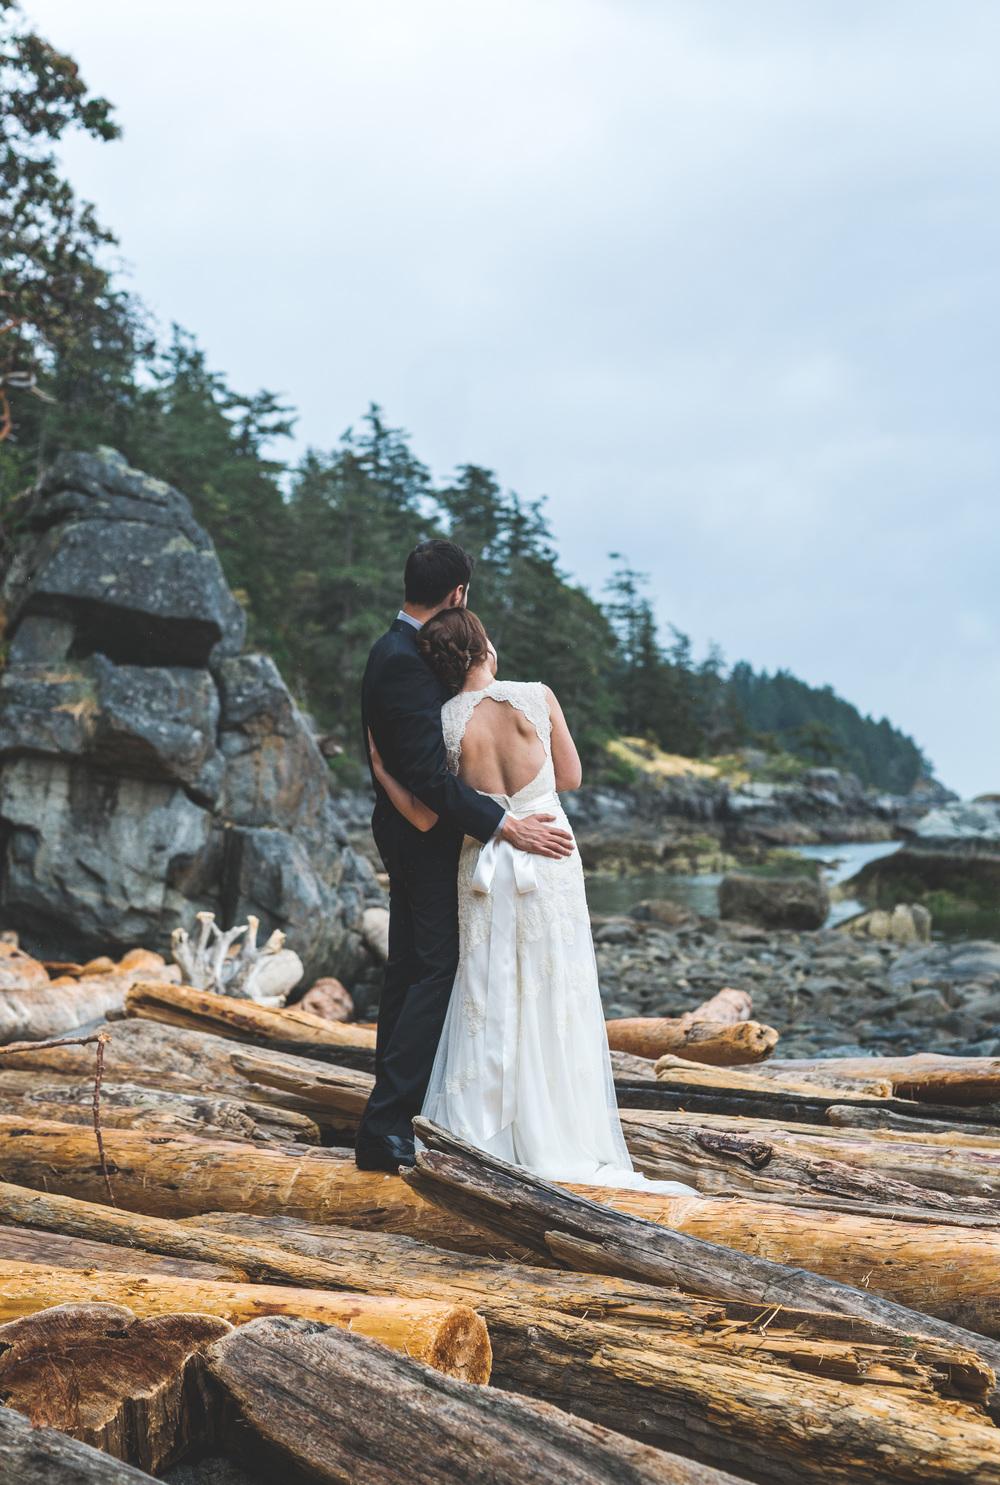 IMG_1604 JENNIFER PICARD PHOTOGRAPHY VANCOUVER WEDDING PHOTOGRAPHER.jpg